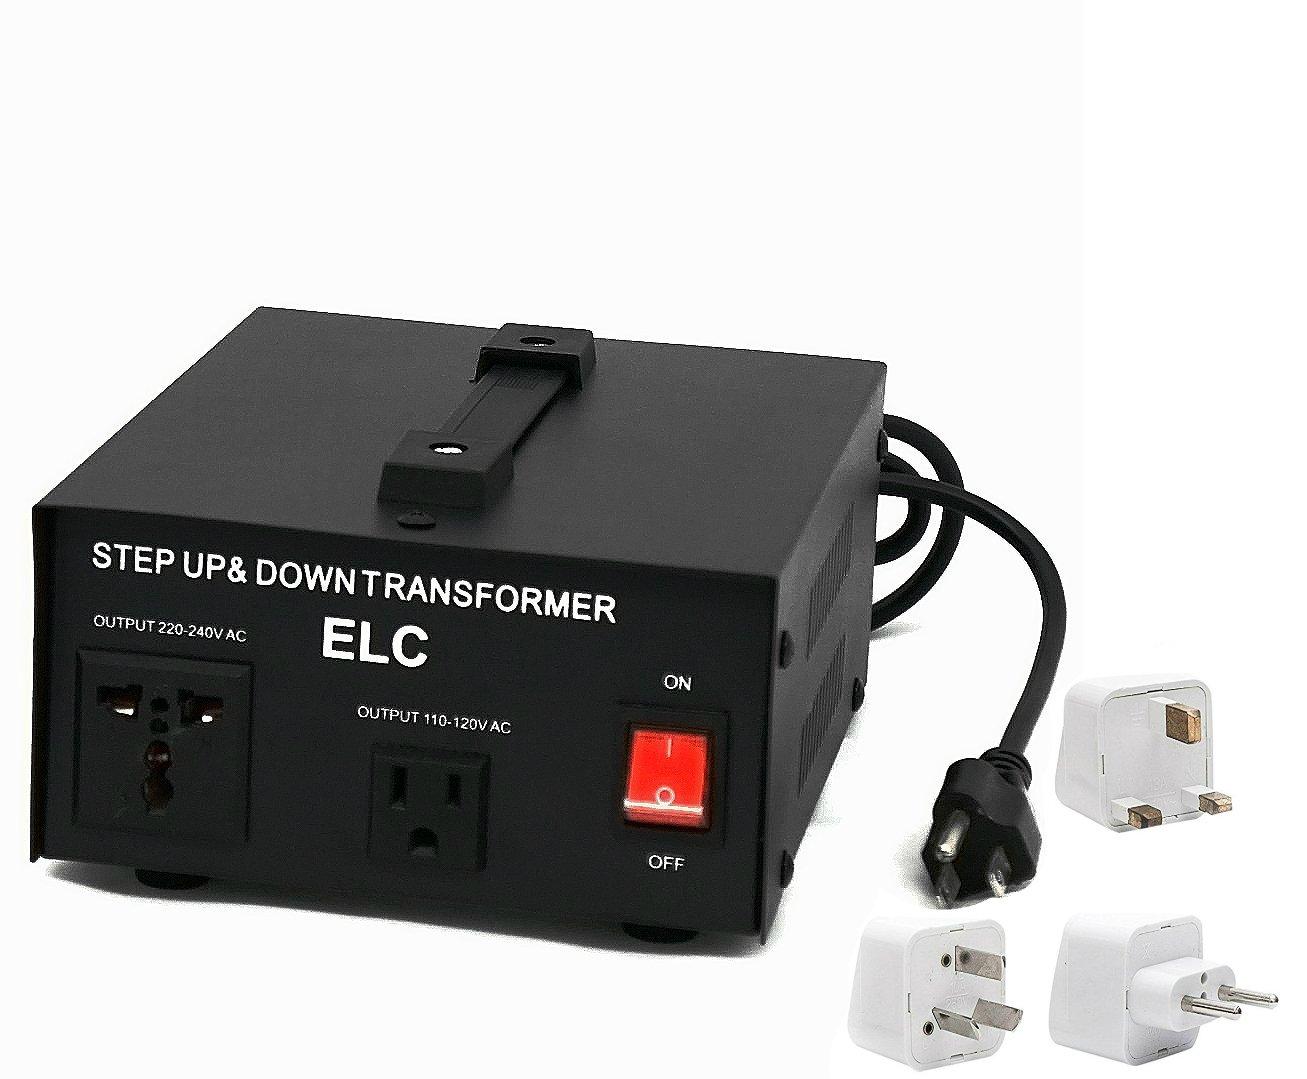 1000 Watt Best International Power Voltage Converter Transformer - Step Up/Down - 110V/220V - with Worldwide UK/US/AU/EU European Plug Adapter - 2 Outlets